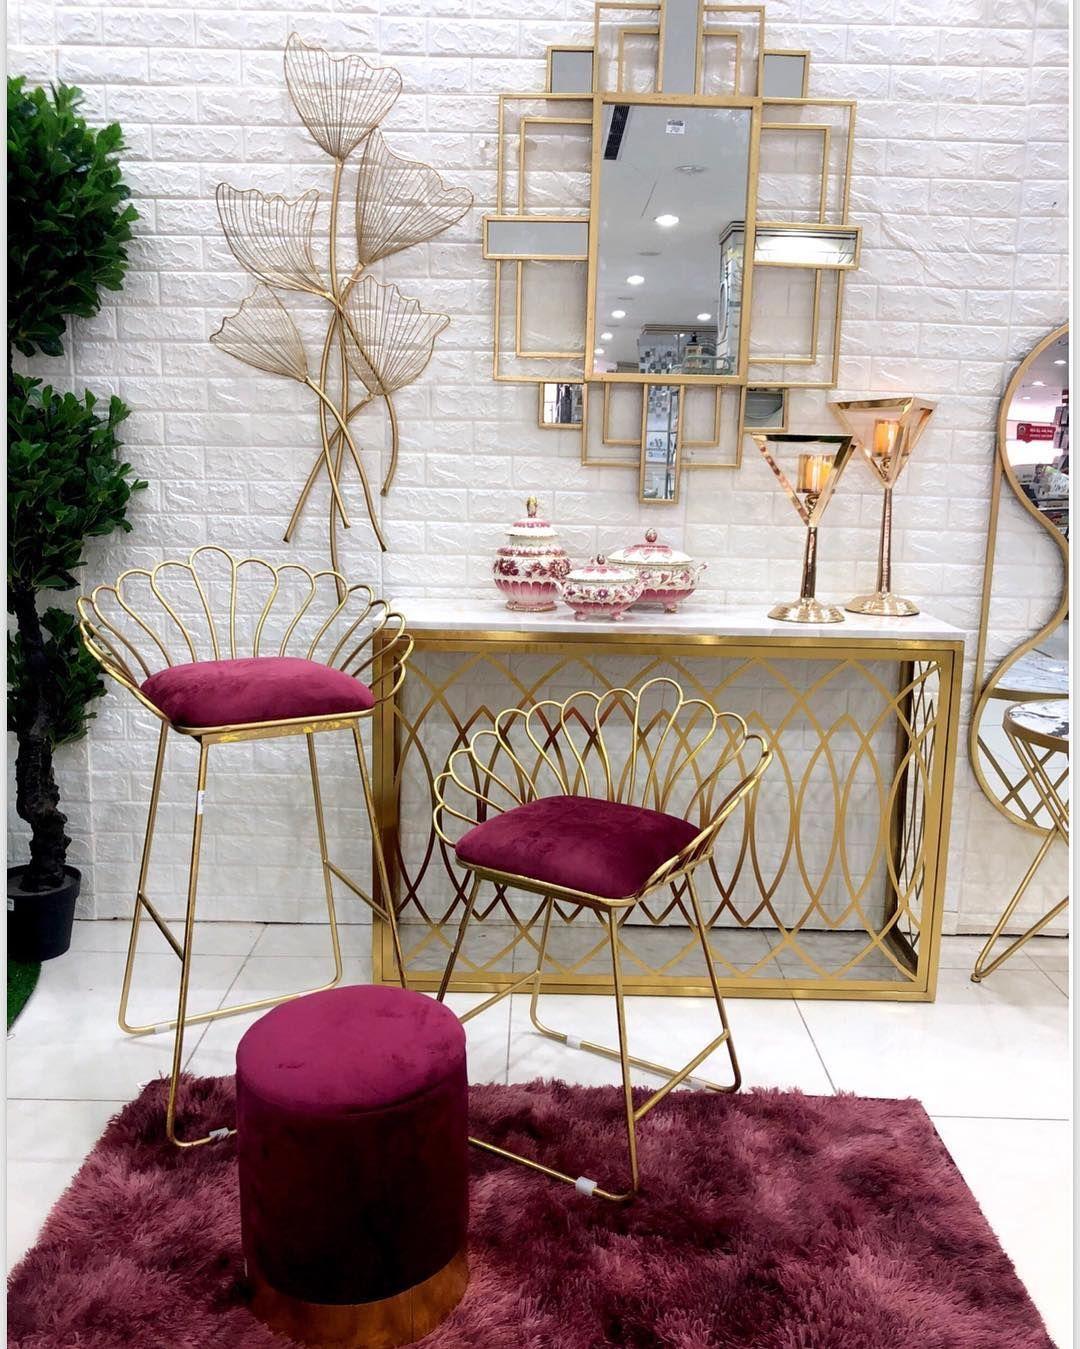 Pin By Mahassen Chahine On Decor Decor Interior Design Home Decor